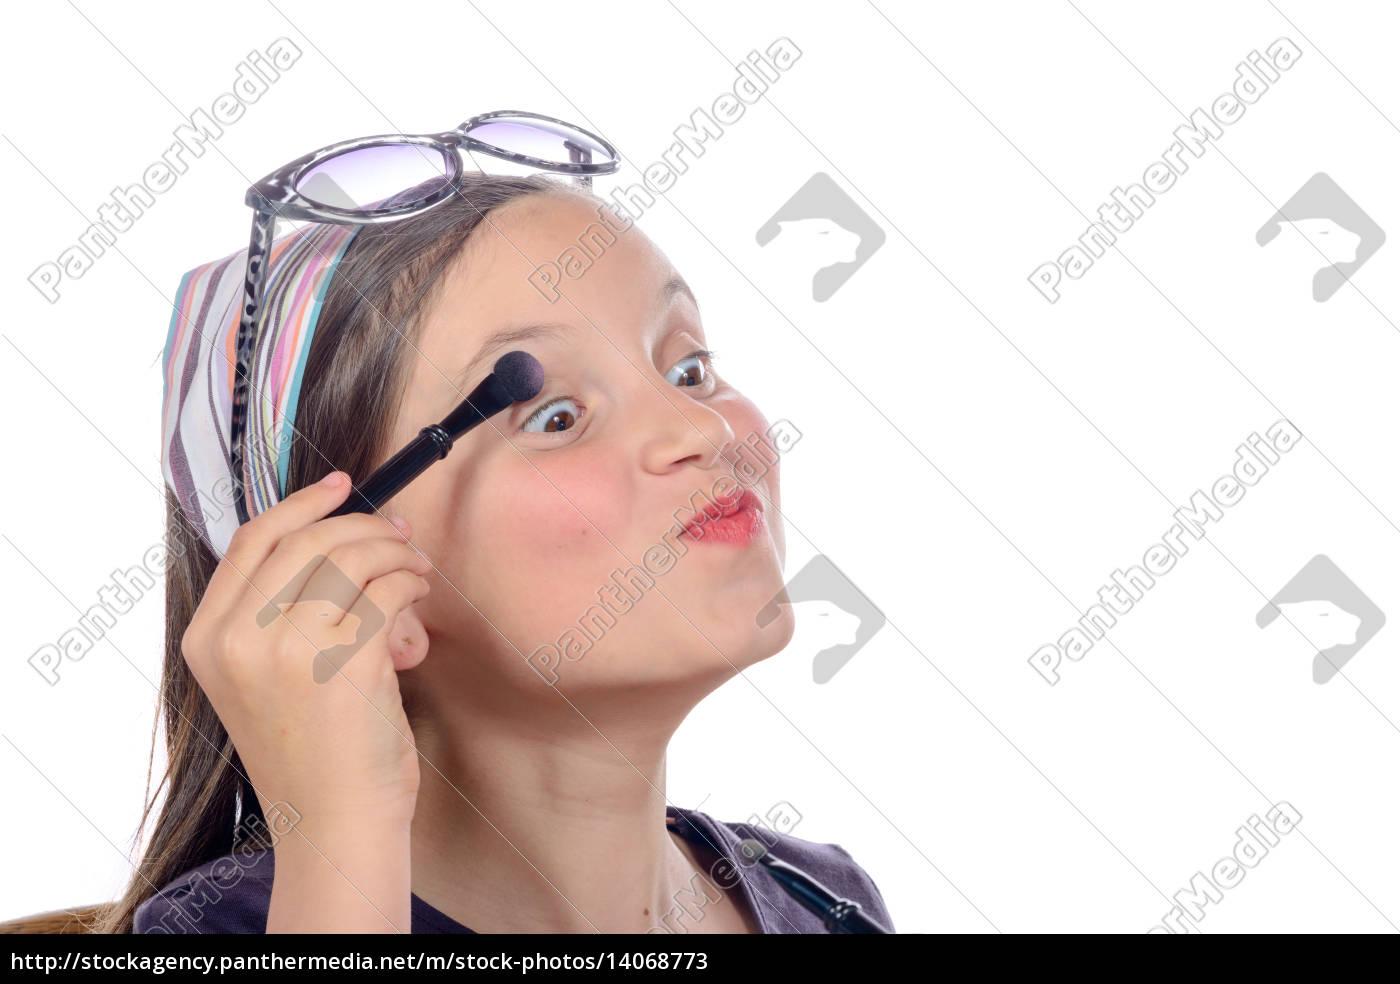 a, little, girl, puts, makeup, of - 14068773